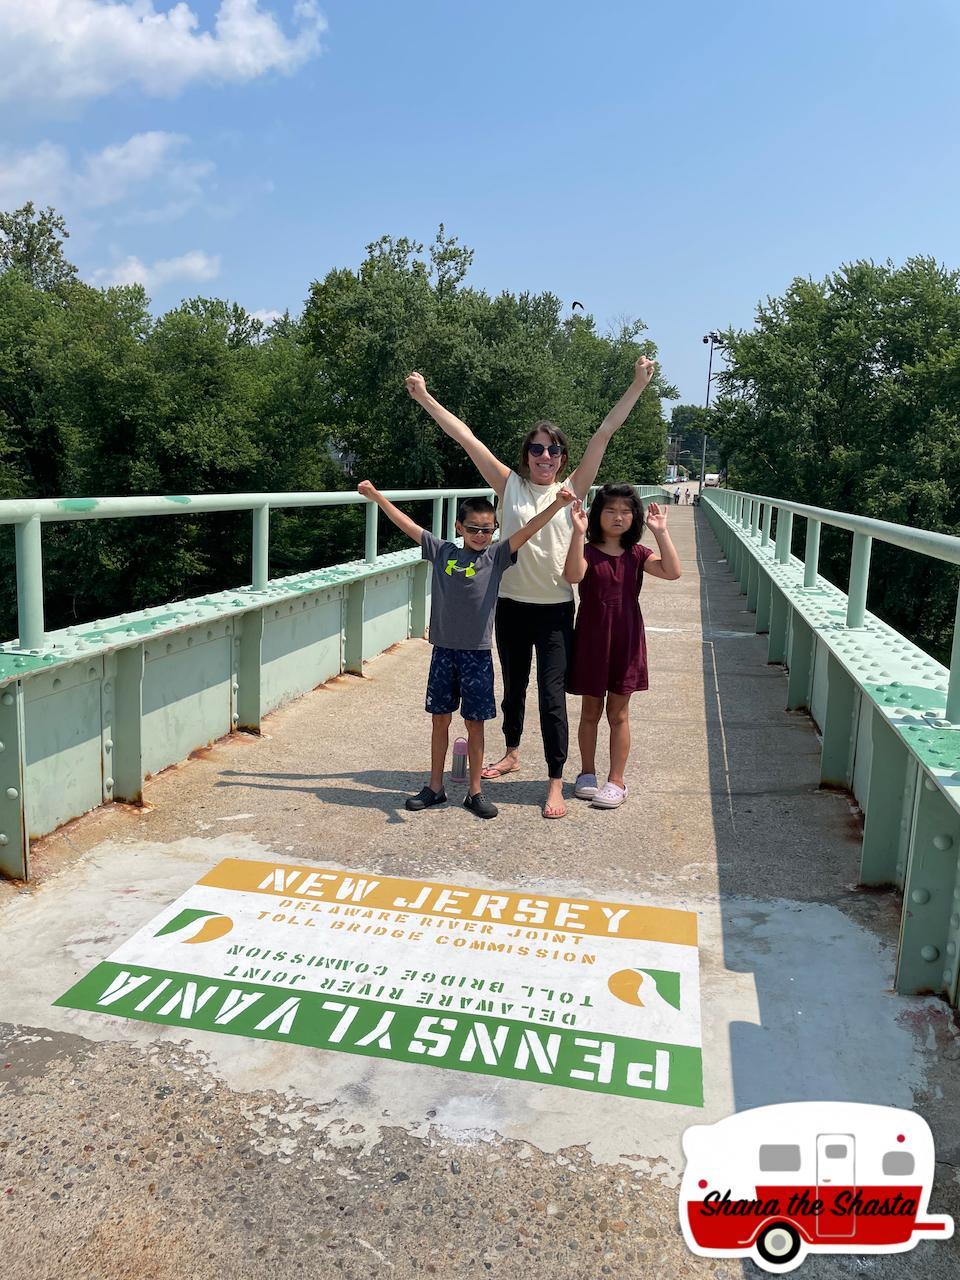 Pennsylvania-New-Jersey-Pedestrian-Bridge